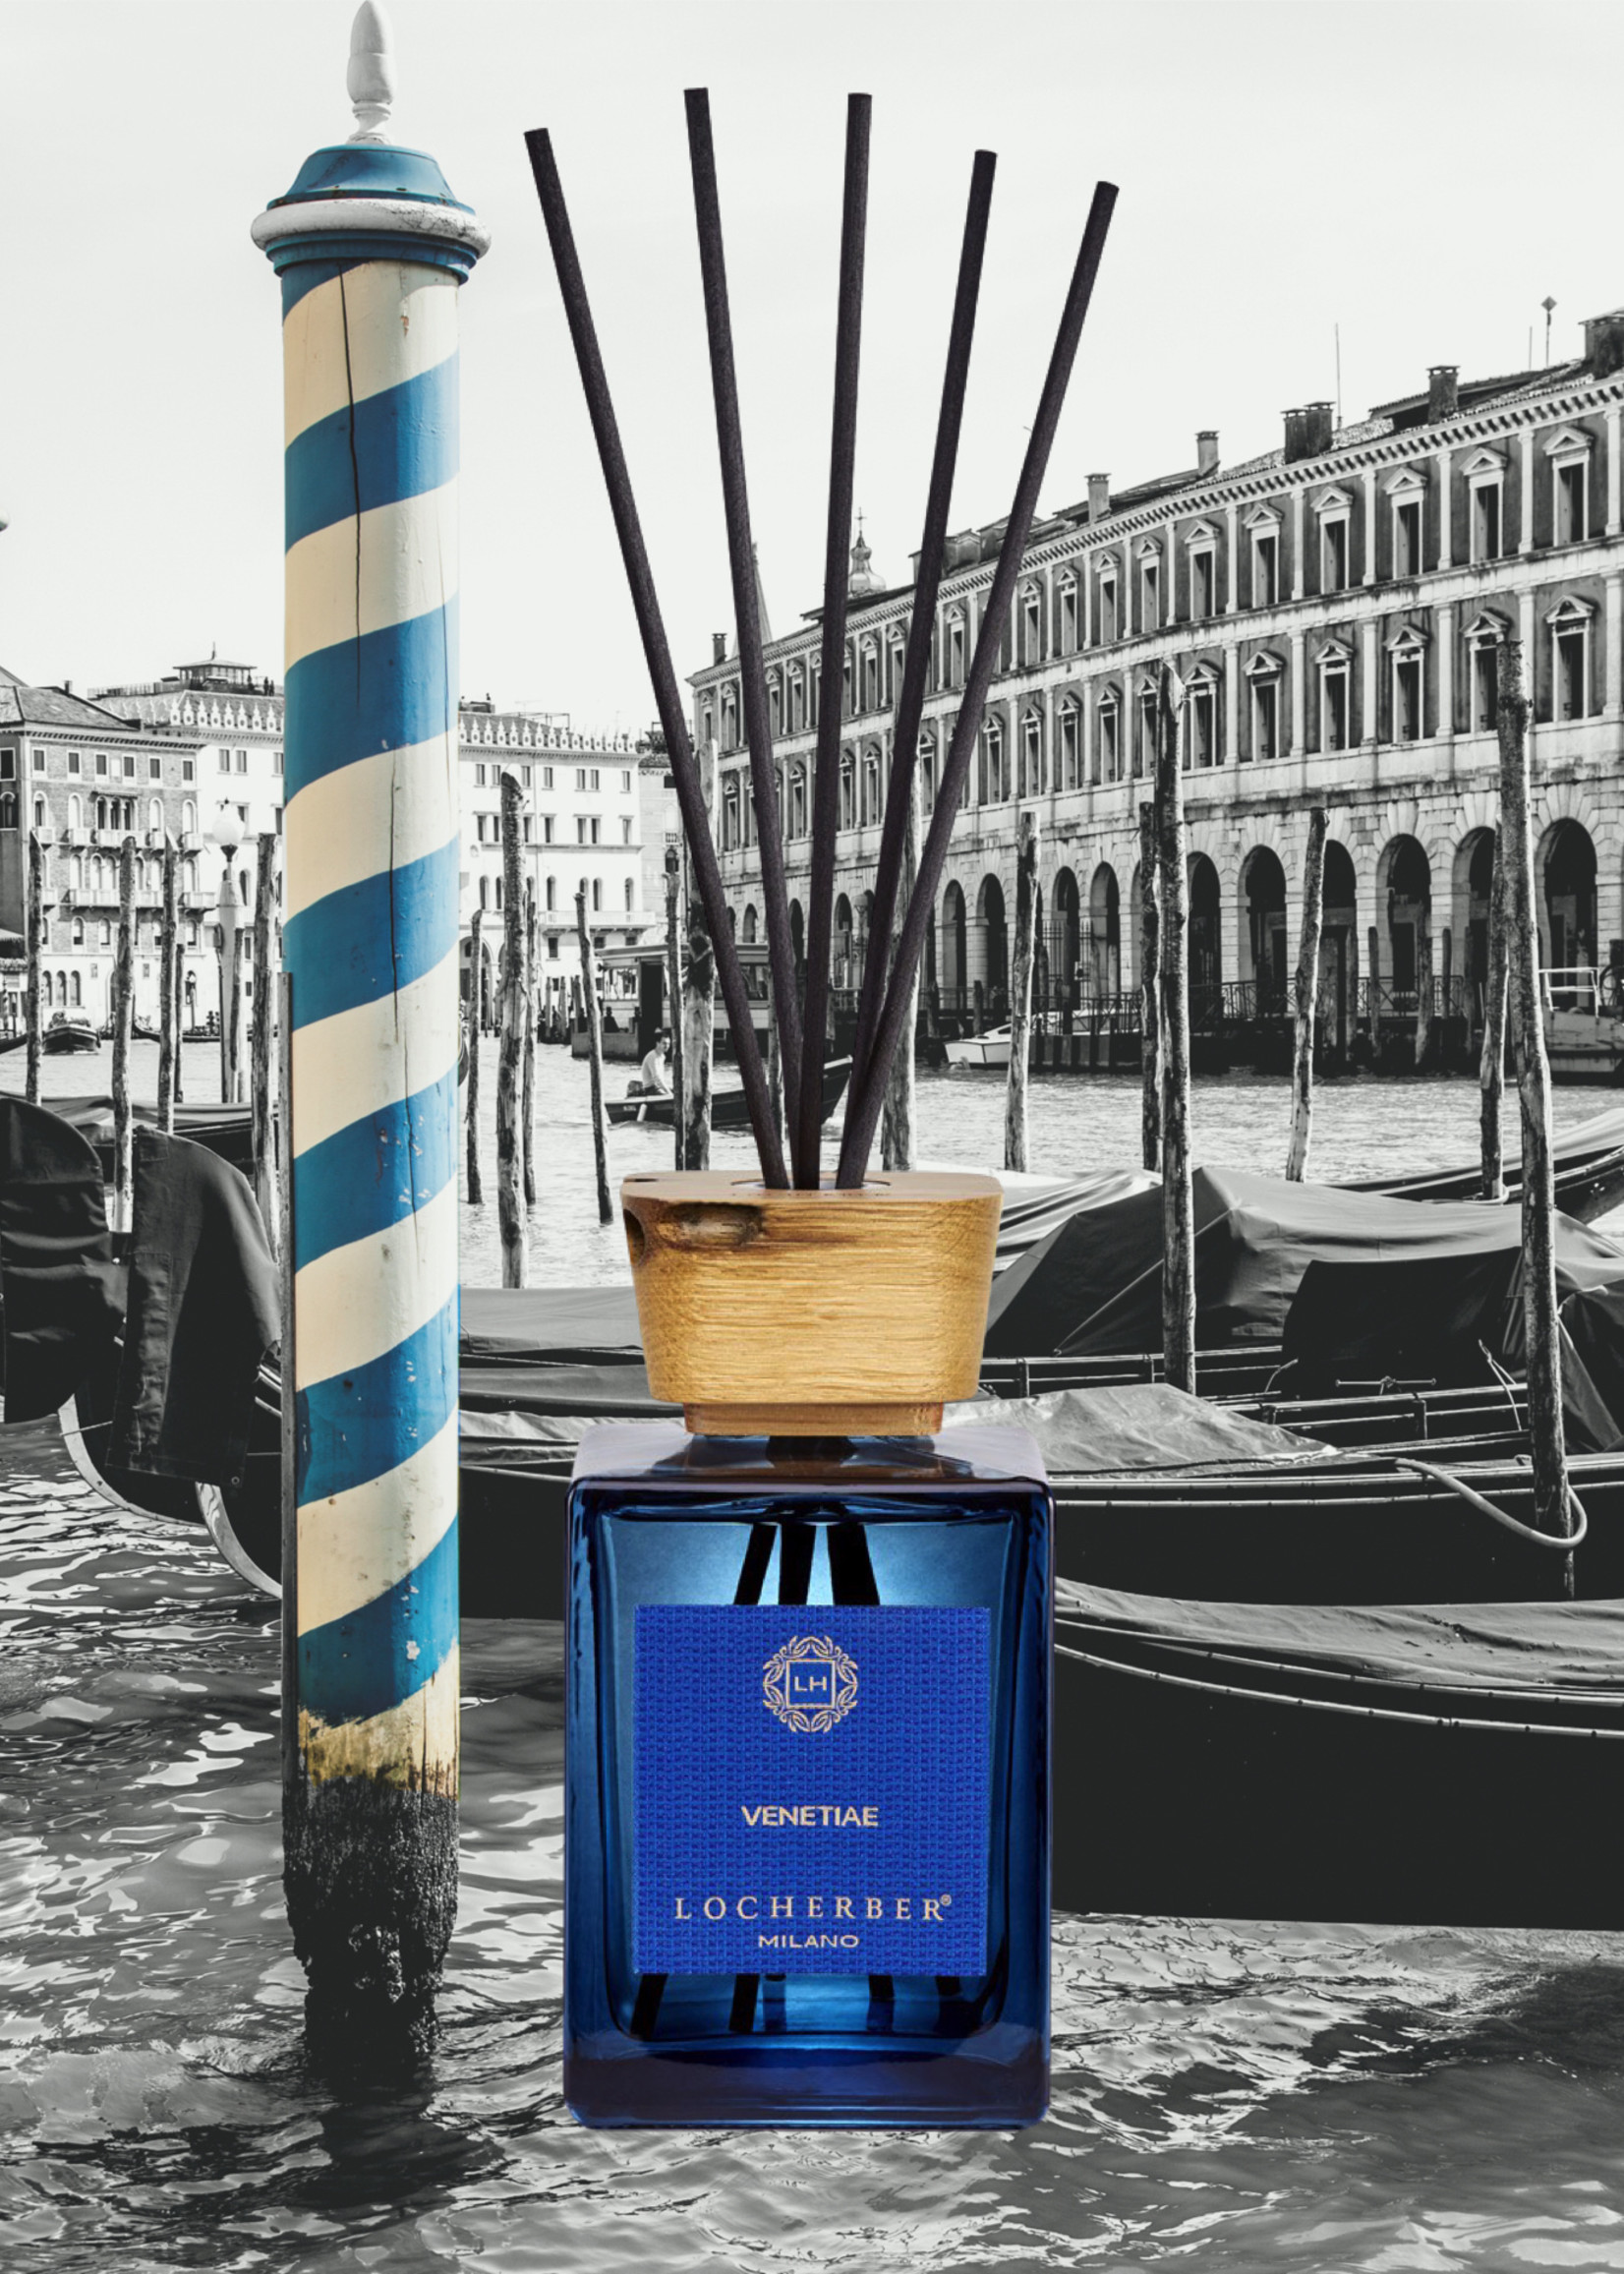 Locherber Locherber Milano - Venetiae - Set Cadeau Diffuseur